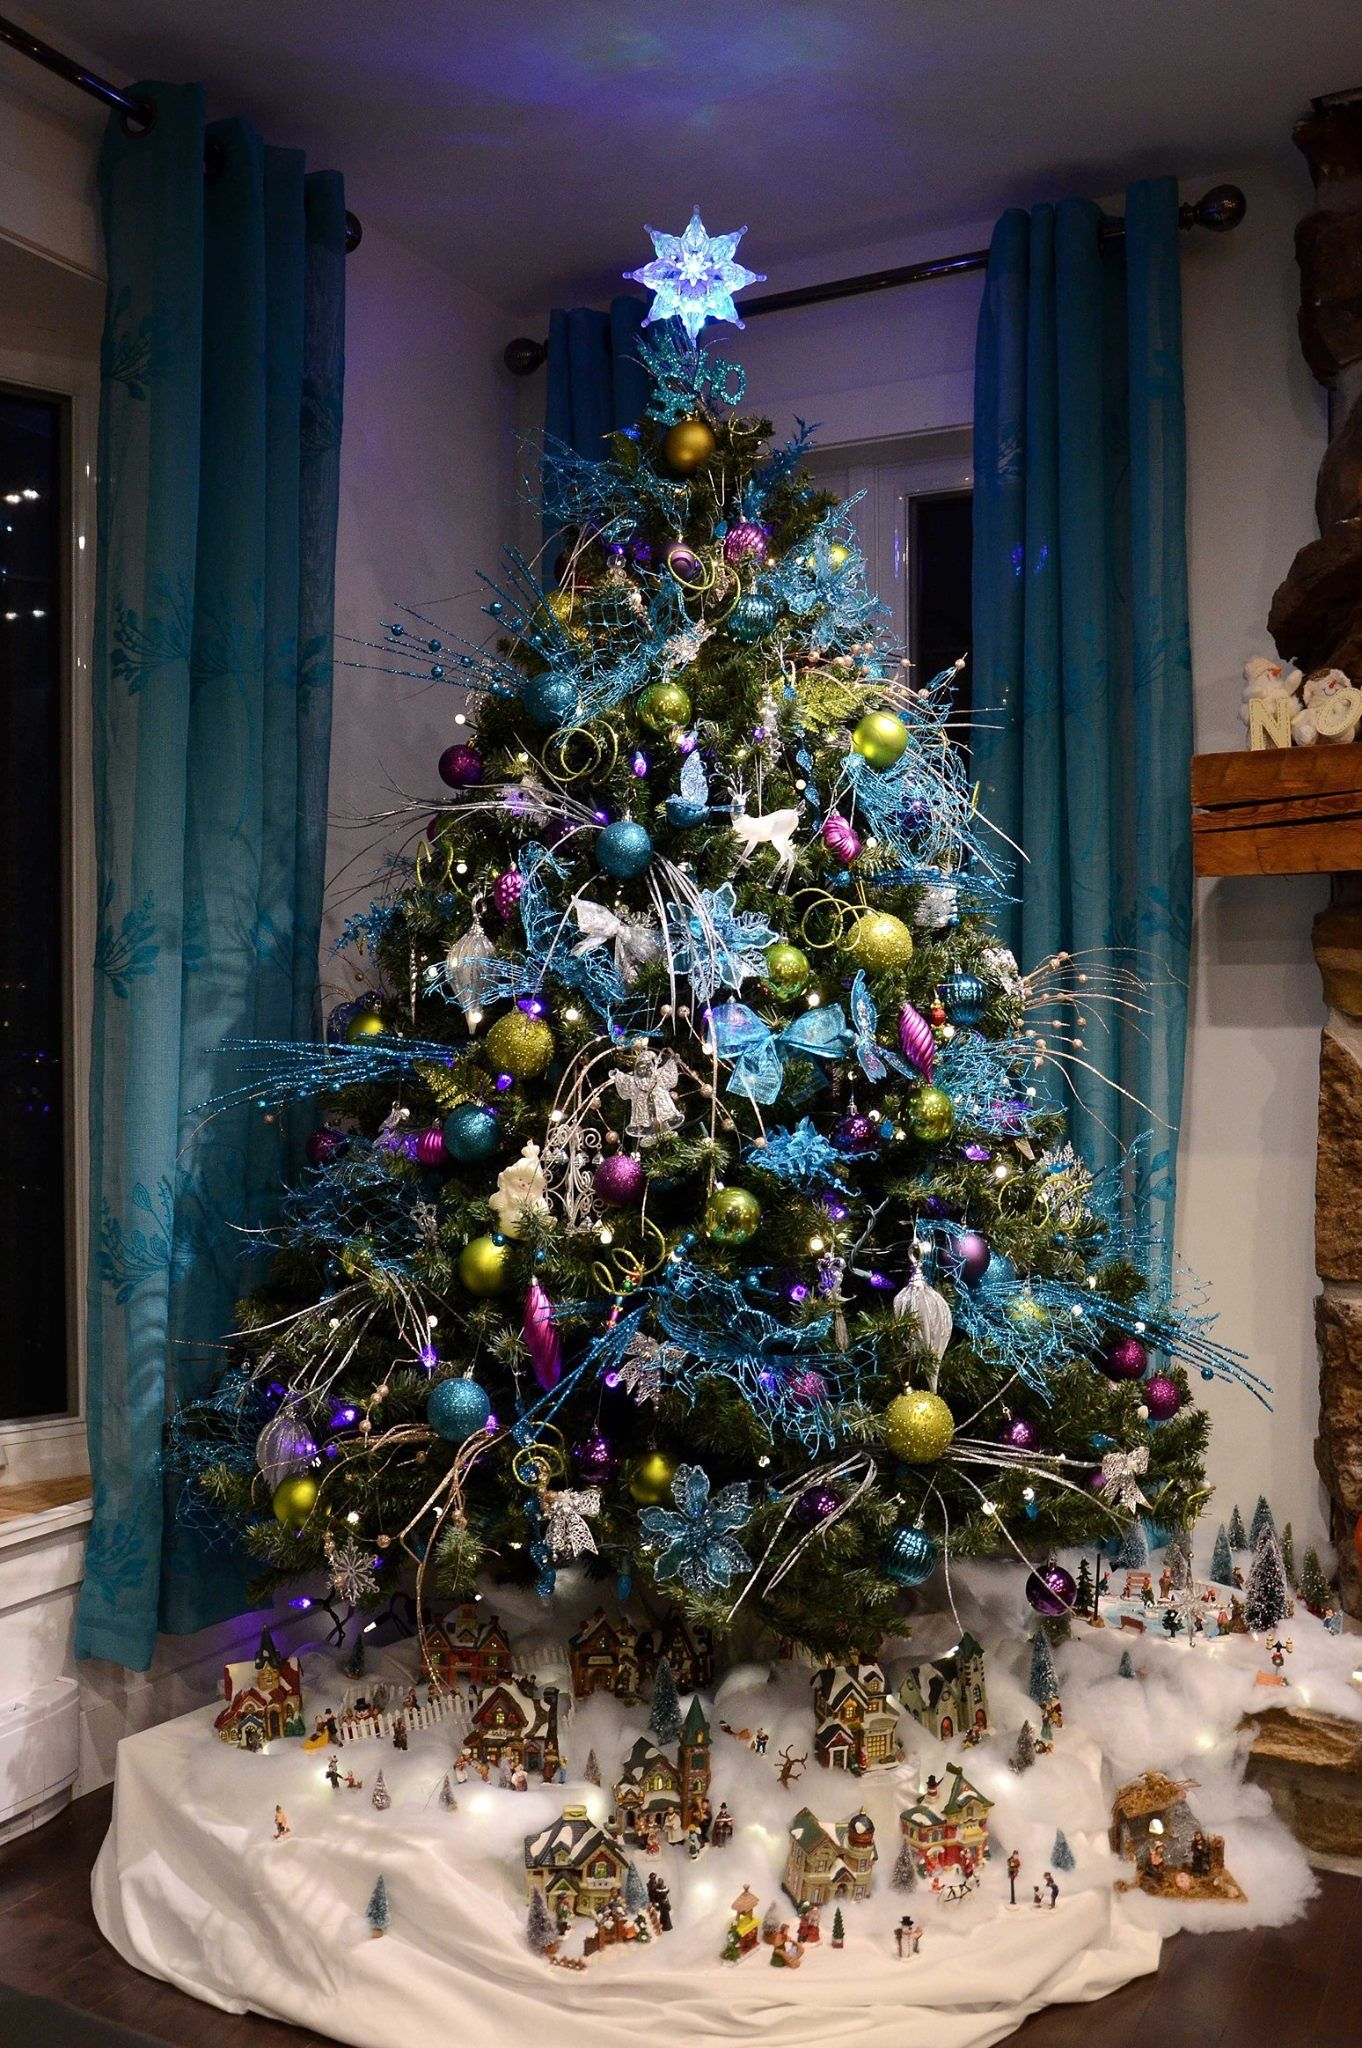 Arbre de Noël Sapin De Noël Sapin Deco Bijoux Sapin de Noël Bijoux Bleu 2 m